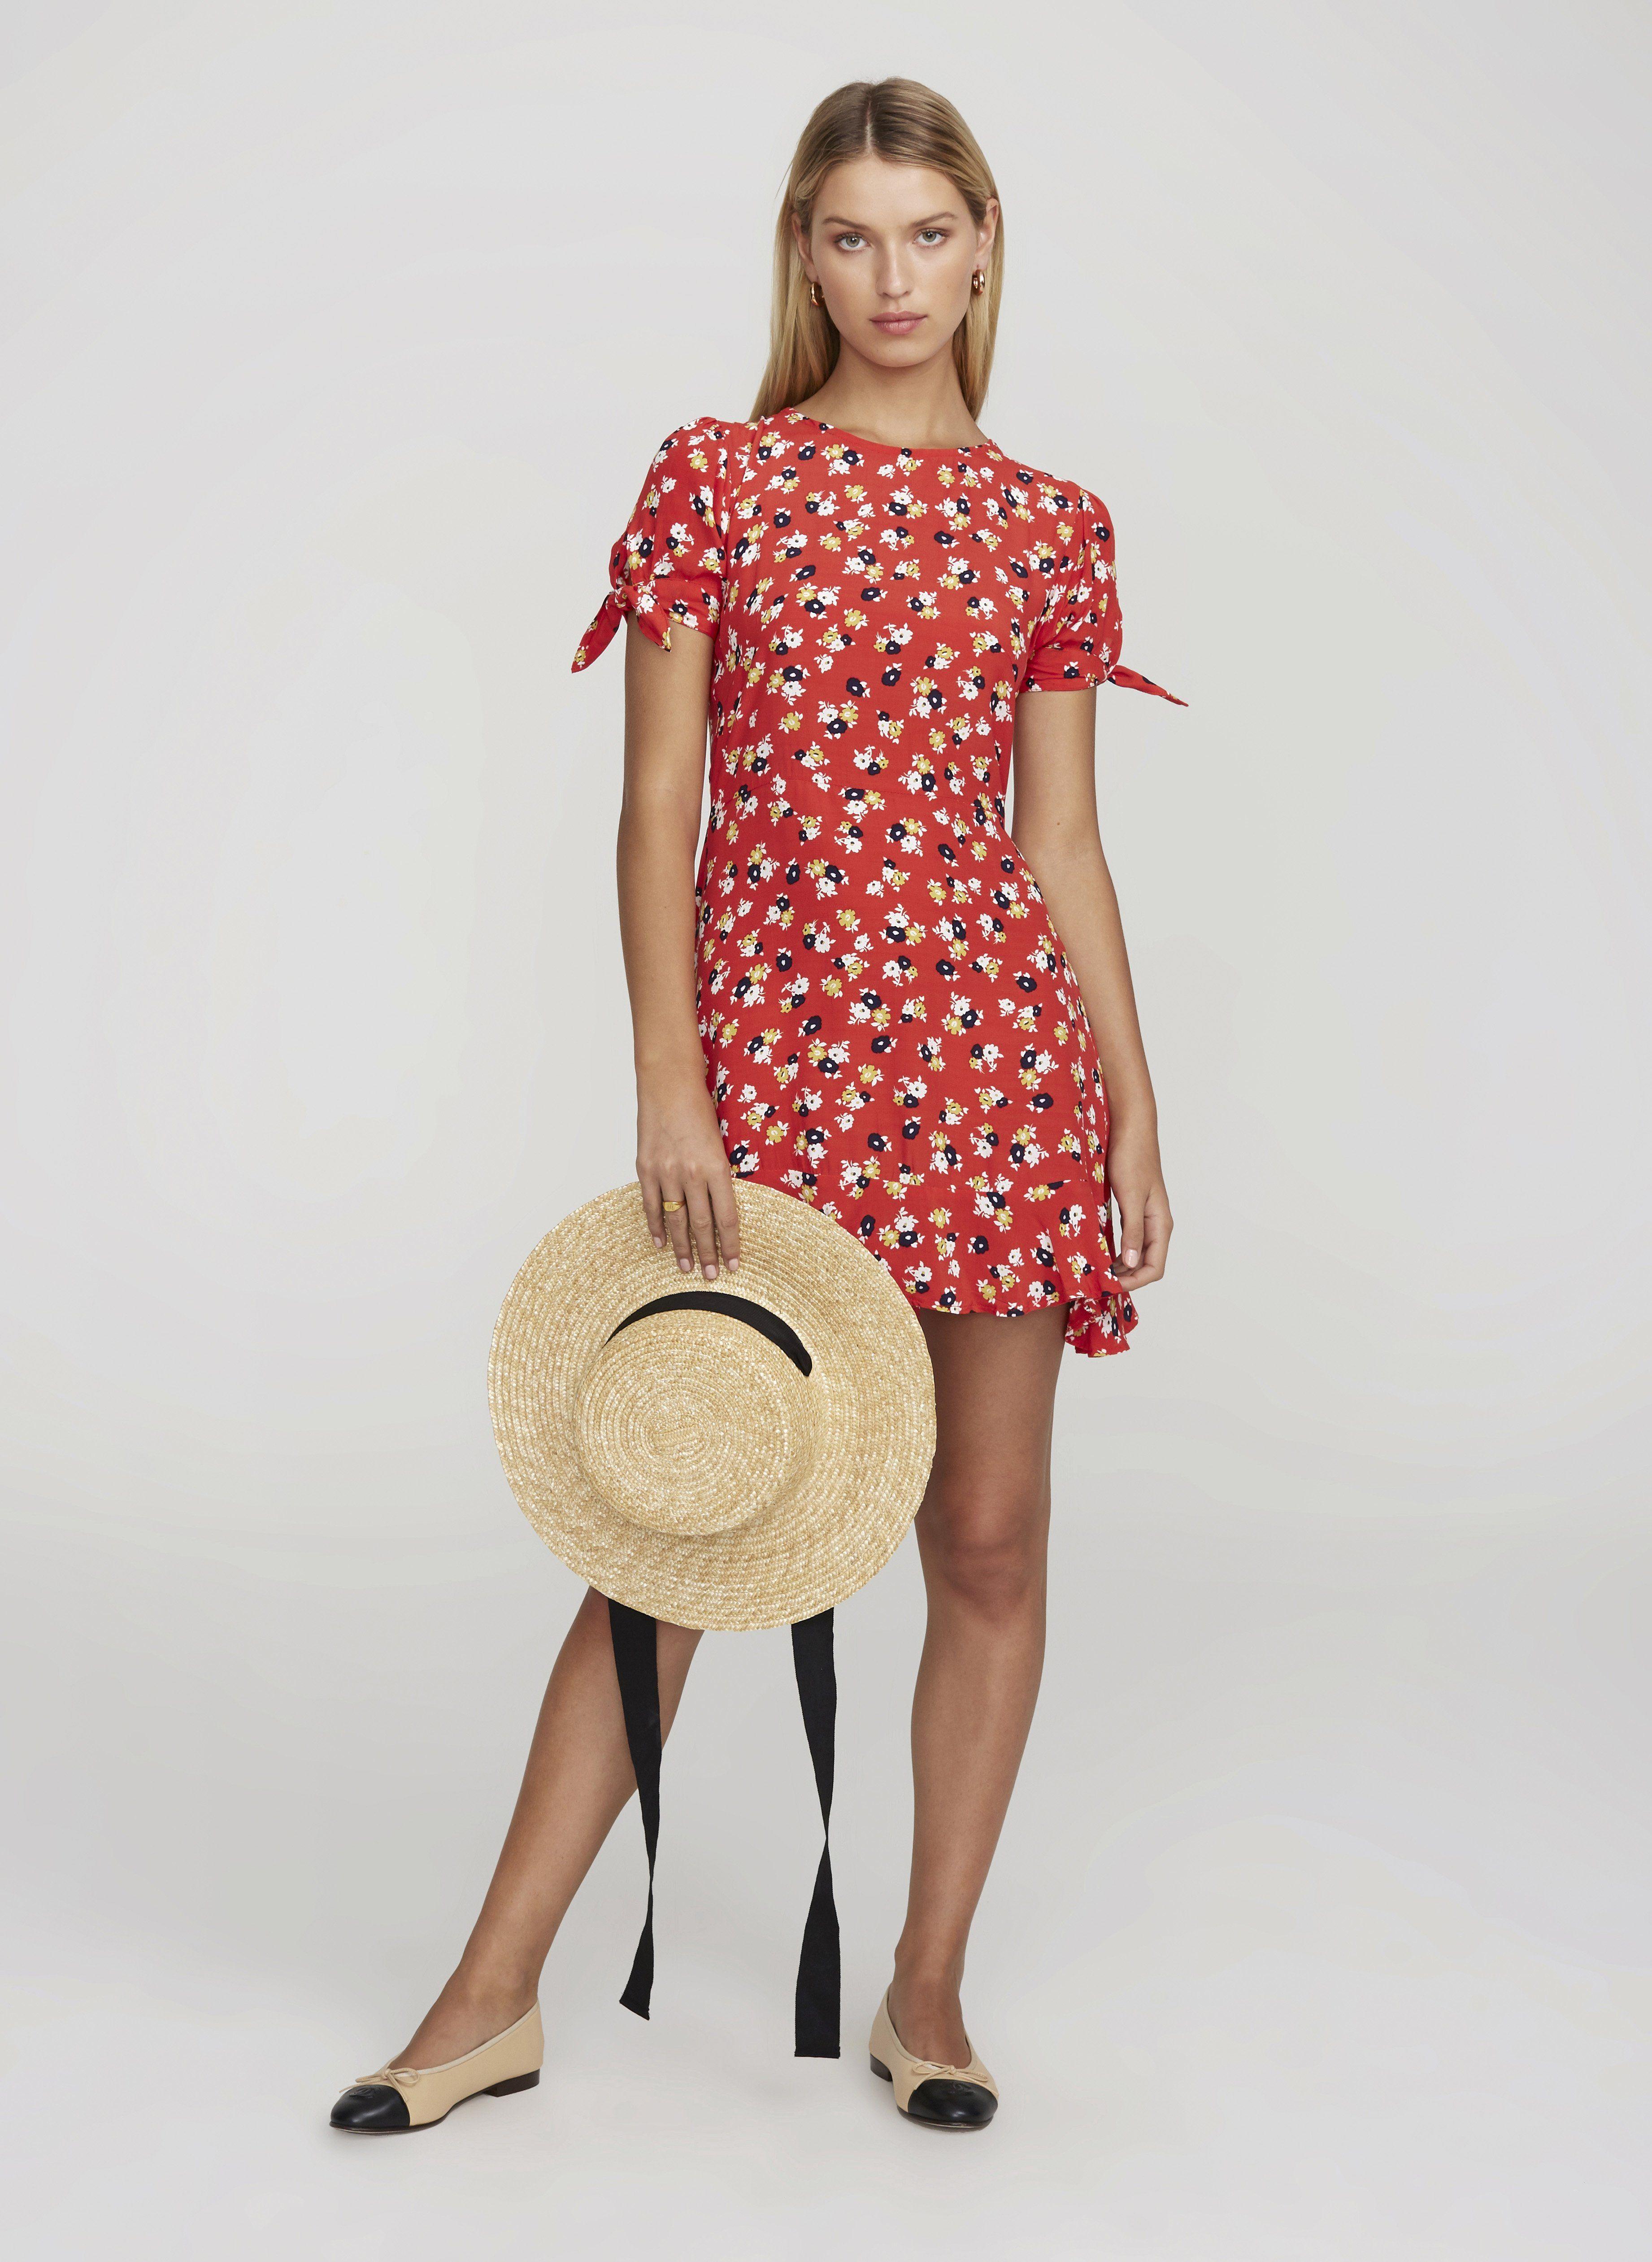 b58151c55af2 JASMINE FLORAL PRINT - RED - DAPHNE DRESS | FAITHFULL THE BRAND |  INTERNATIONAL